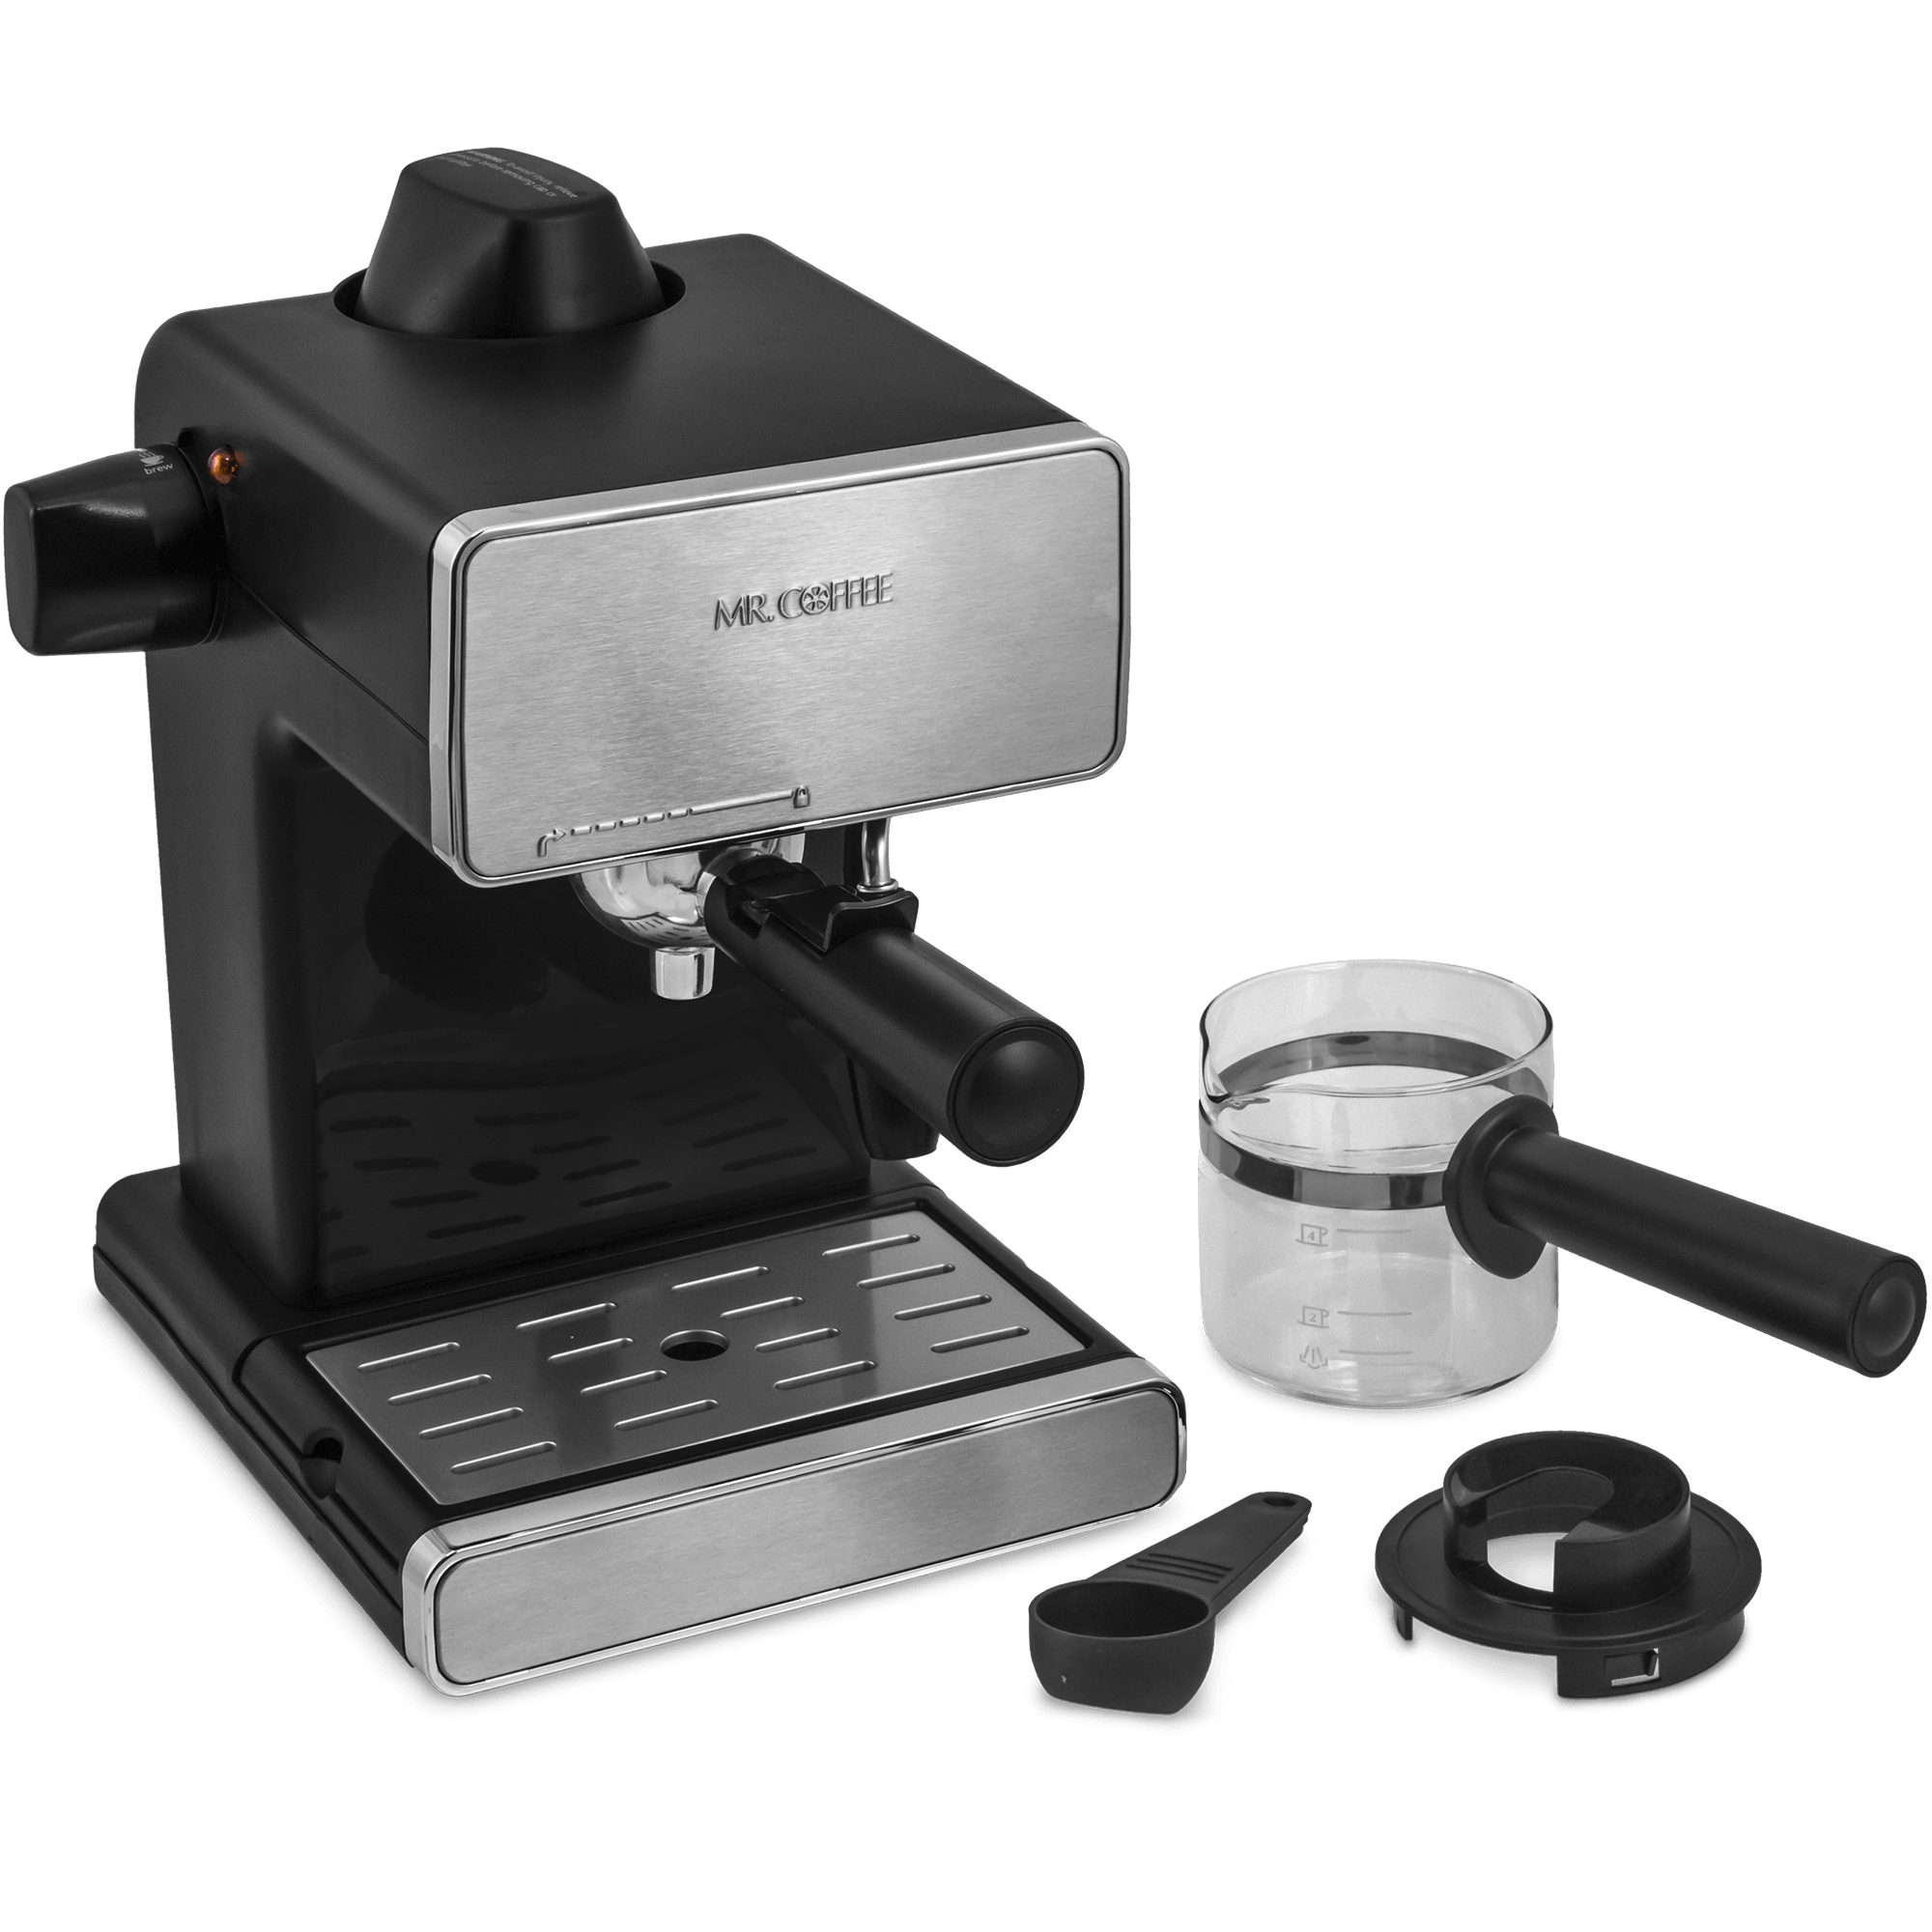 mr coffee espresso machine manual